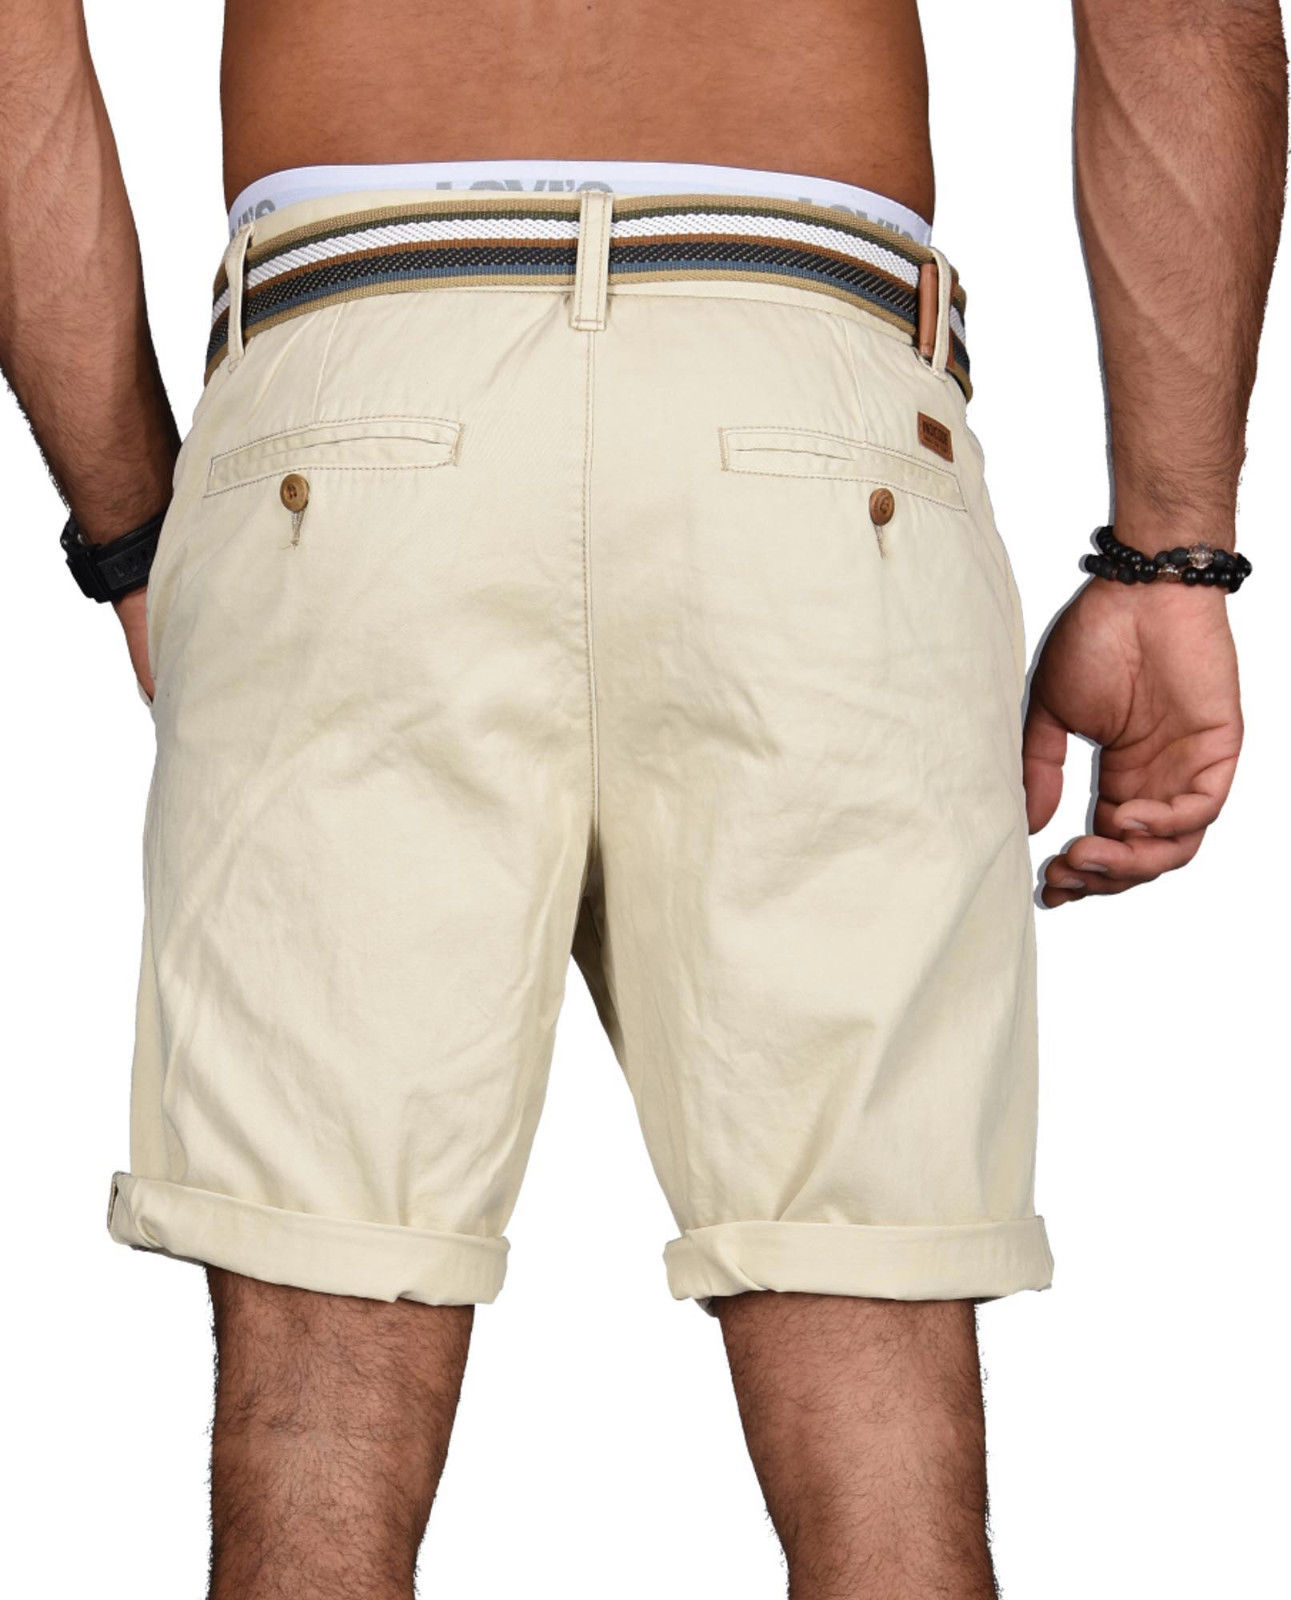 Indicode-Herren-Sommer-Bermuda-Chino-Shorts-kurze-Hose-Sommerhose-Short-NEU-B499 Indexbild 5